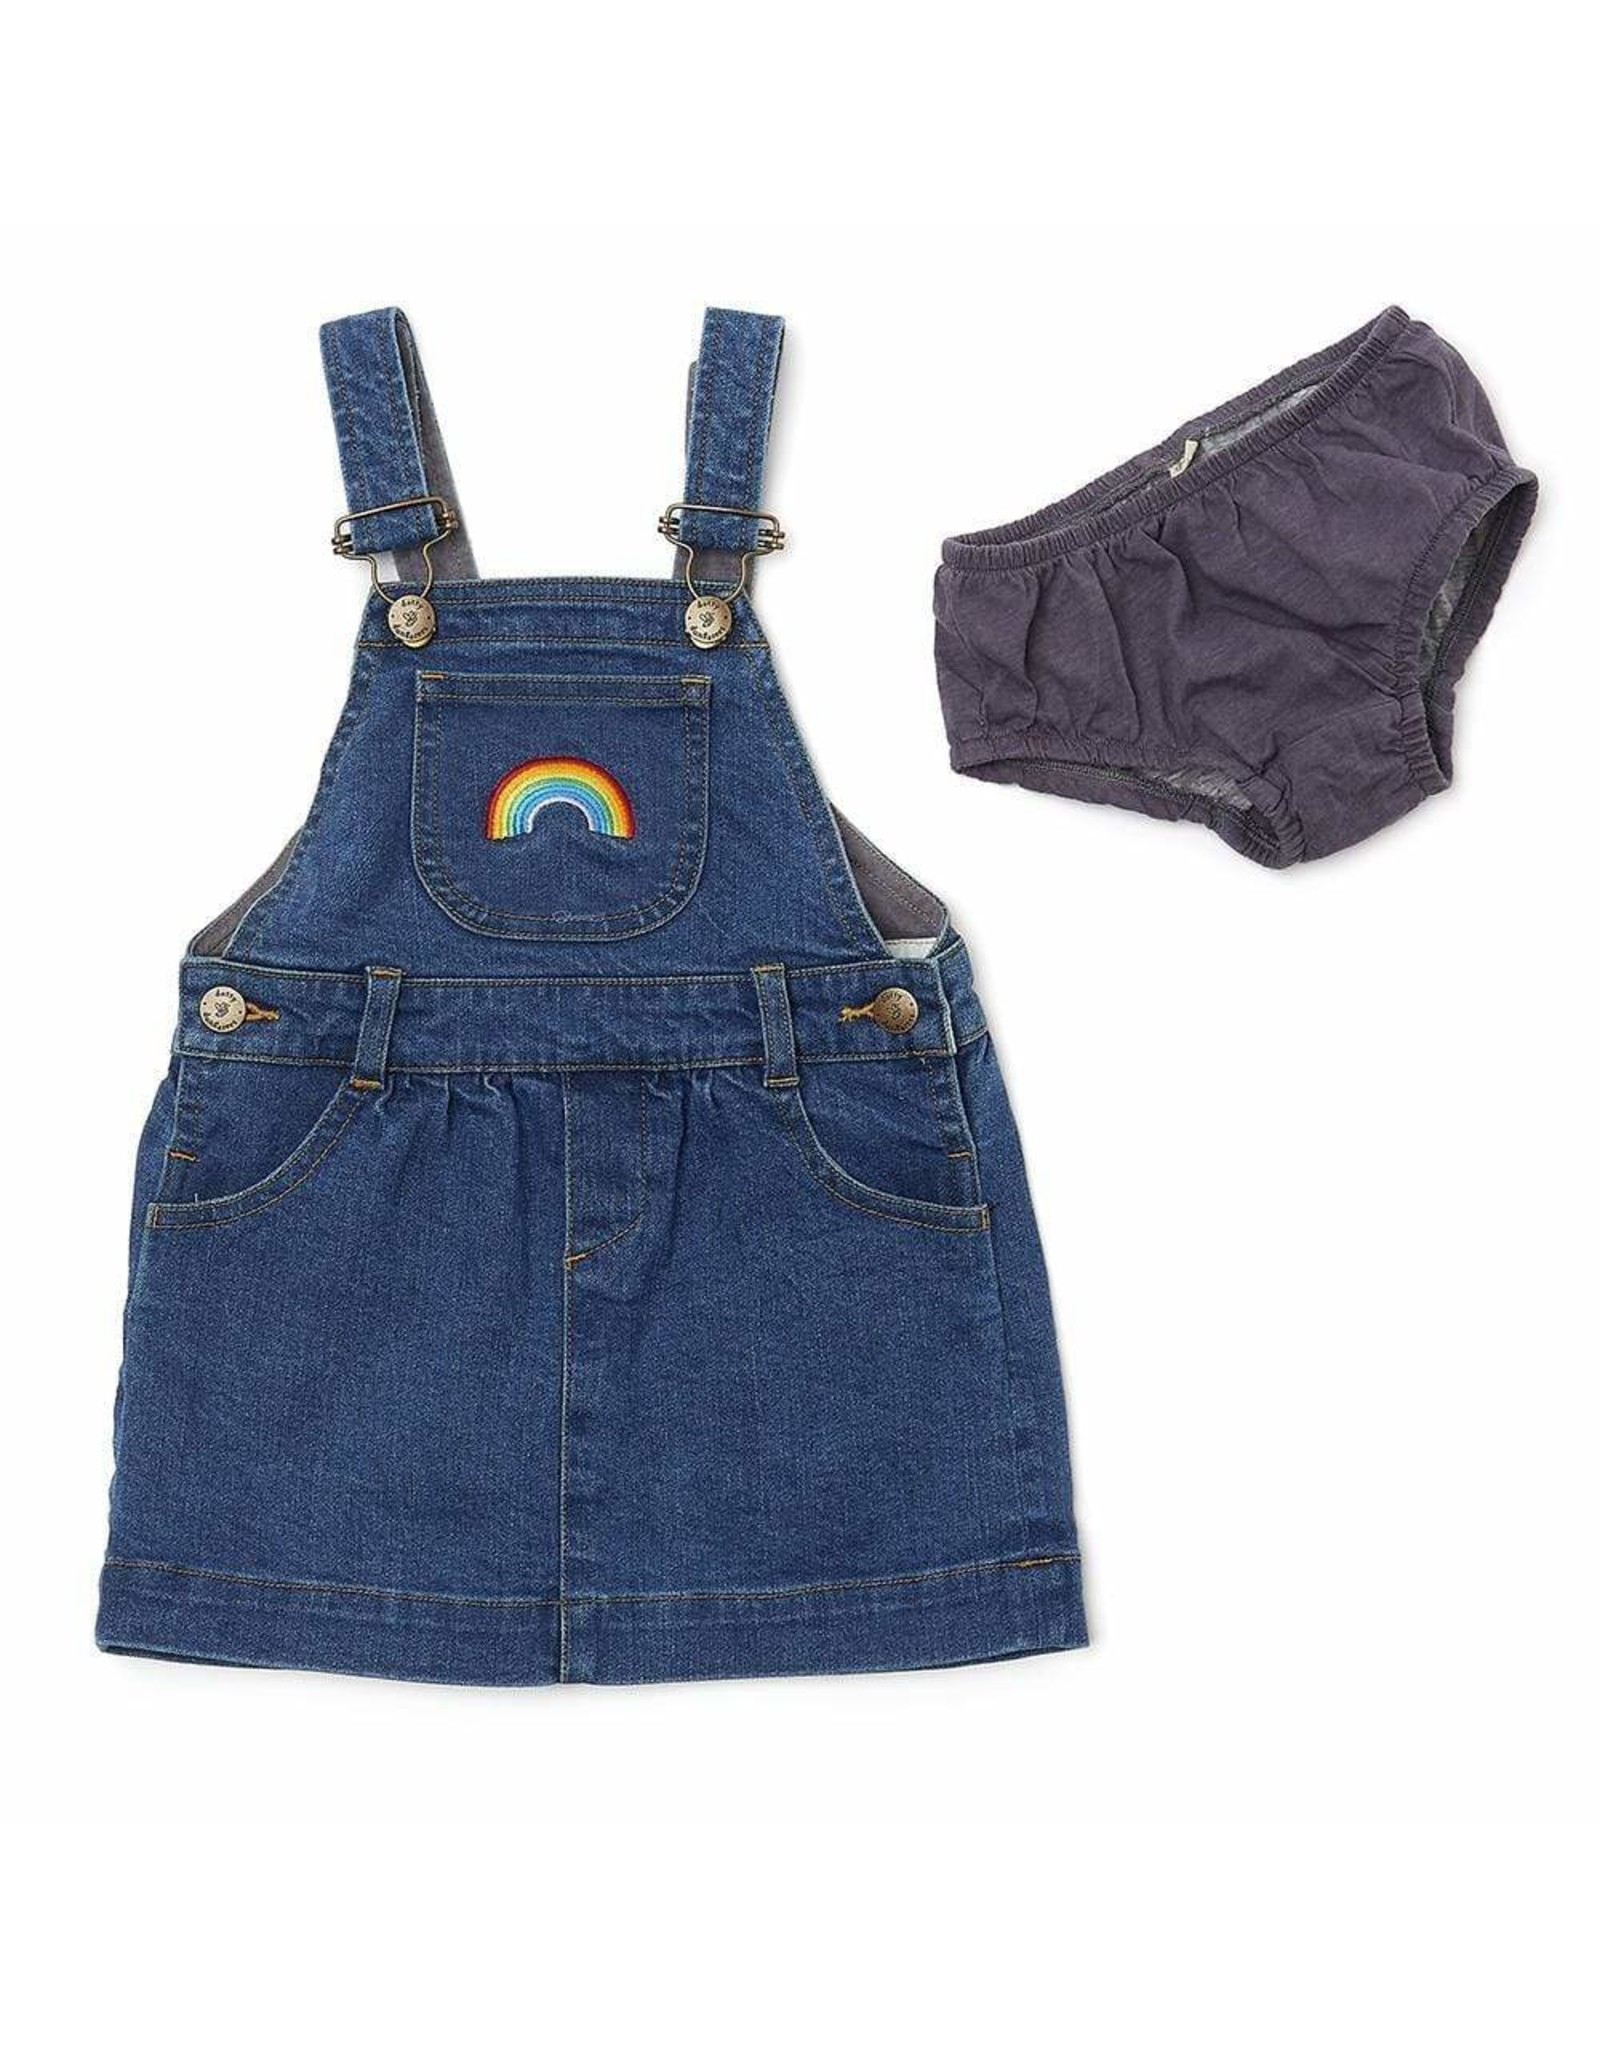 Dotty Dungarees Stonewash Denim Rainbow Dress